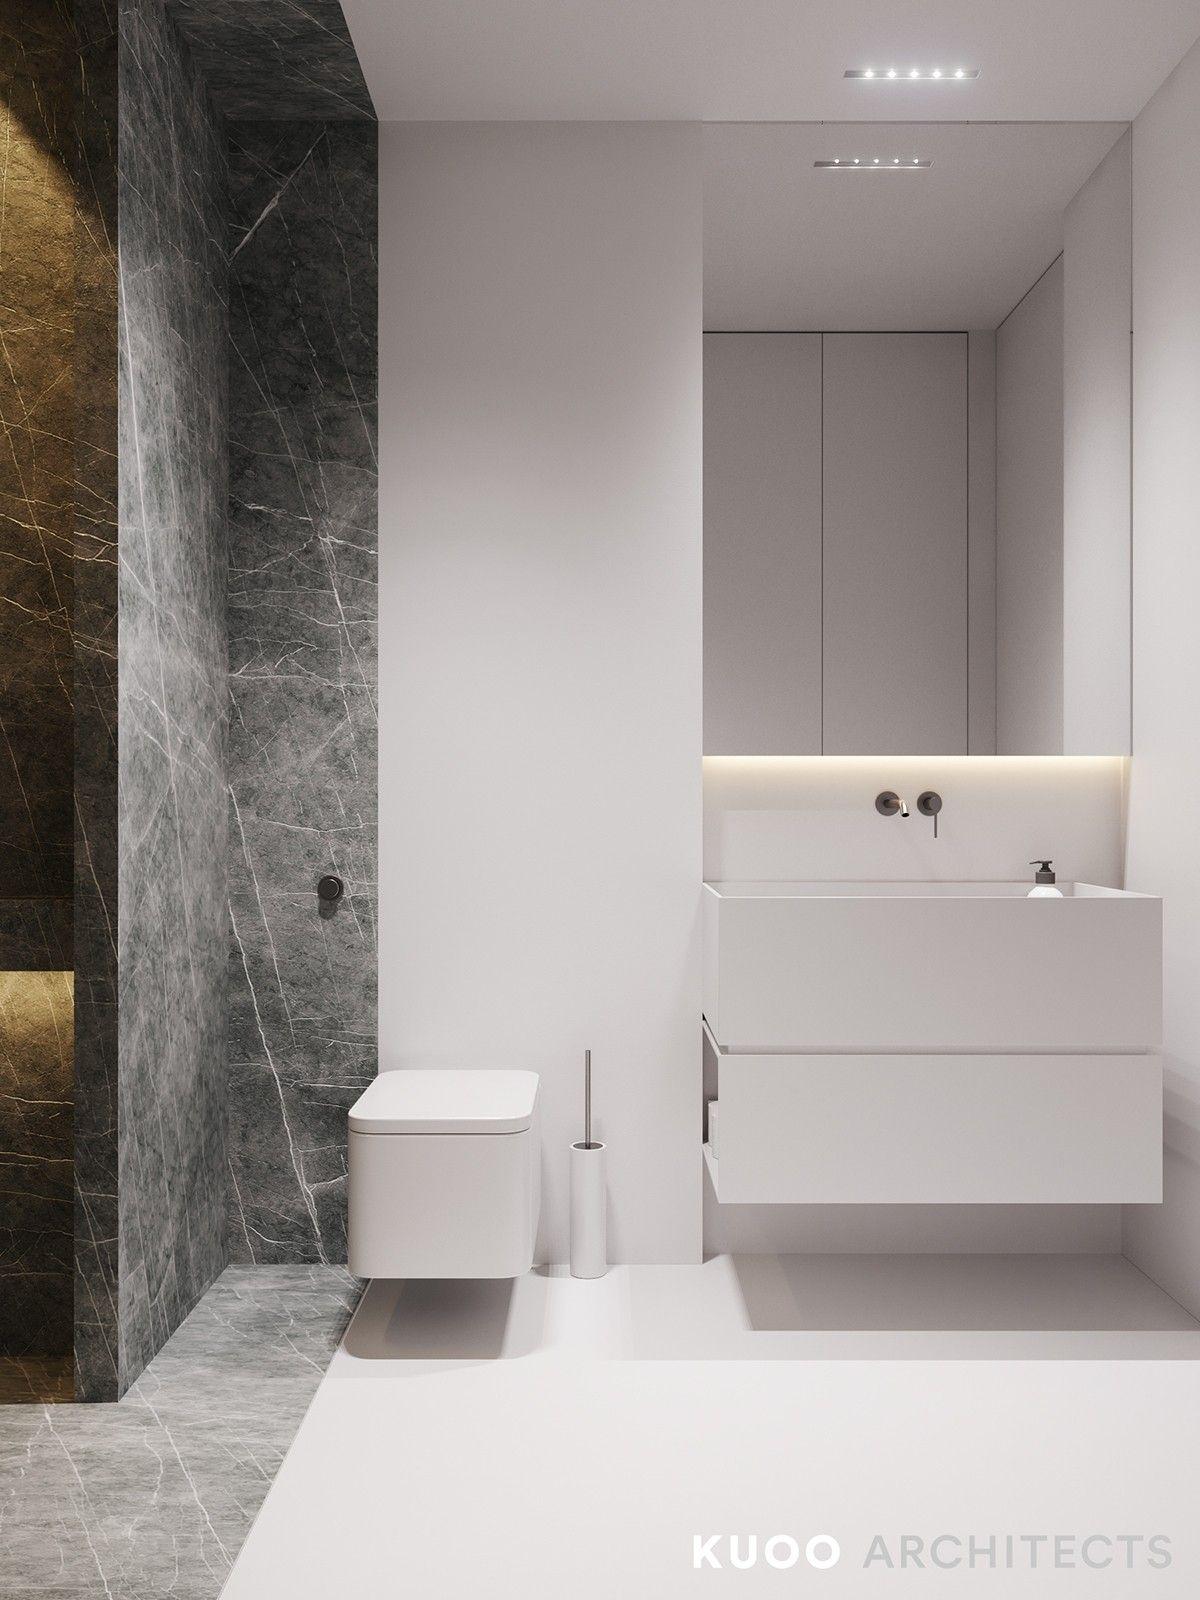 Pin by Michael Rohey on bath concepts | Pinterest | Bath, Bathroom ...